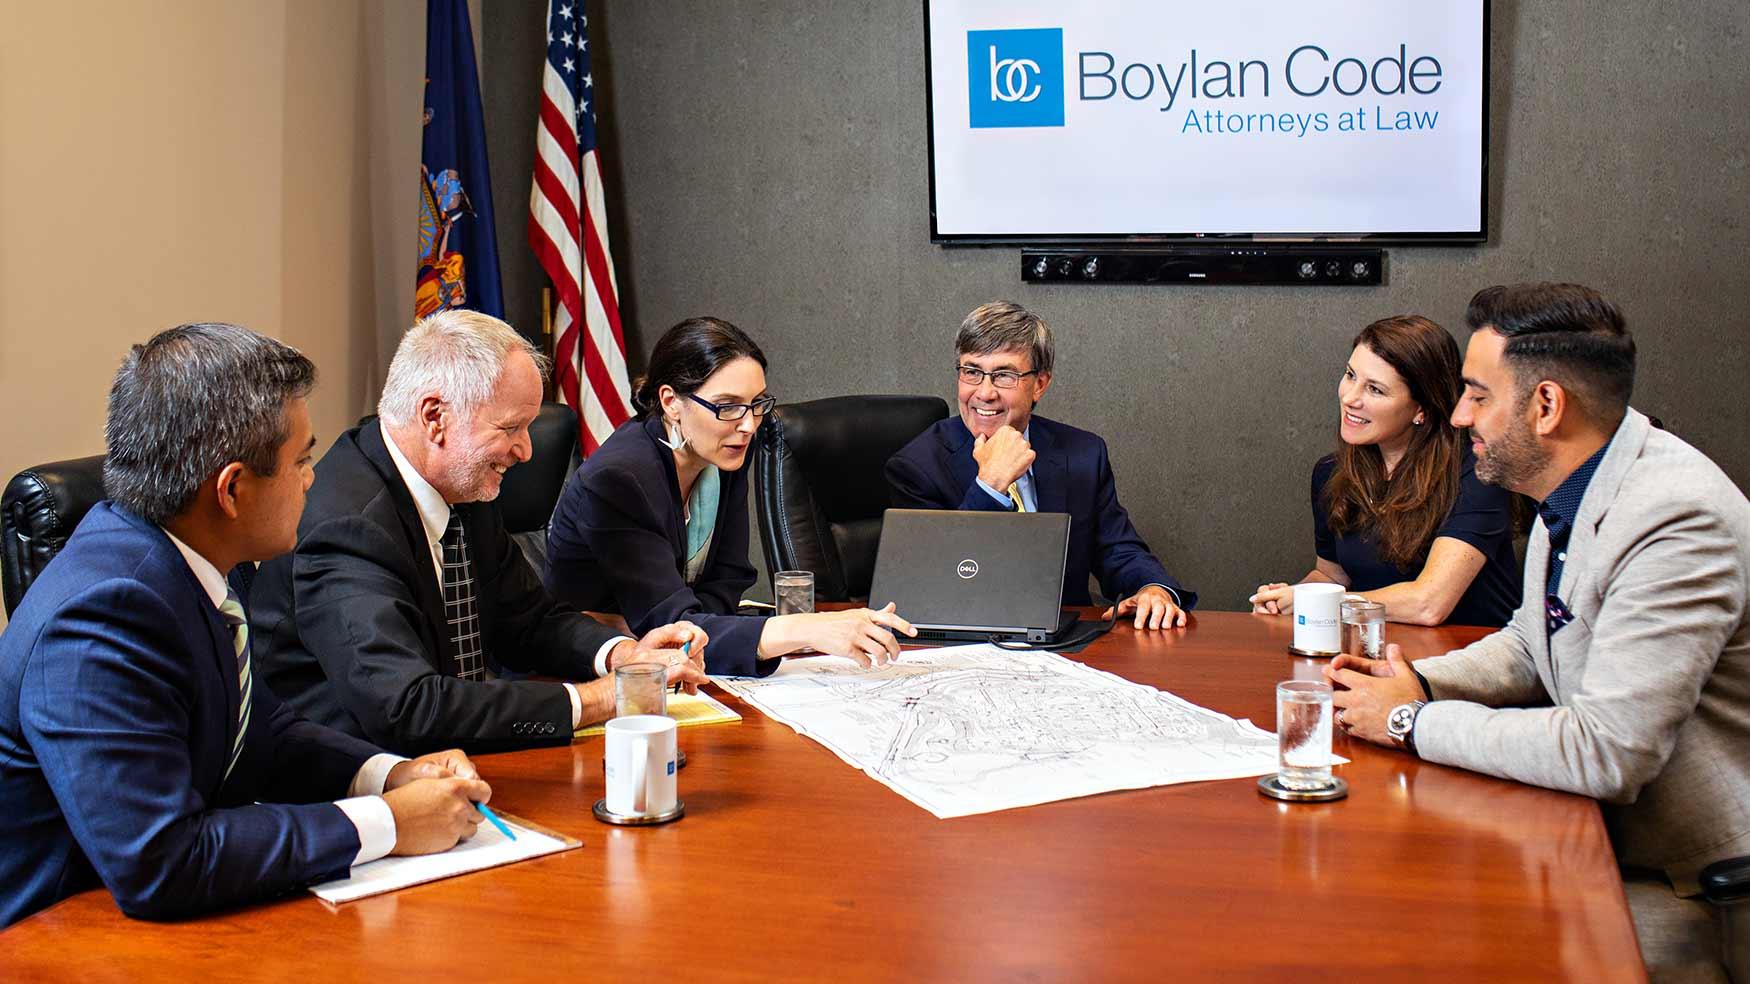 Lawyers-Meeting-Blueprints